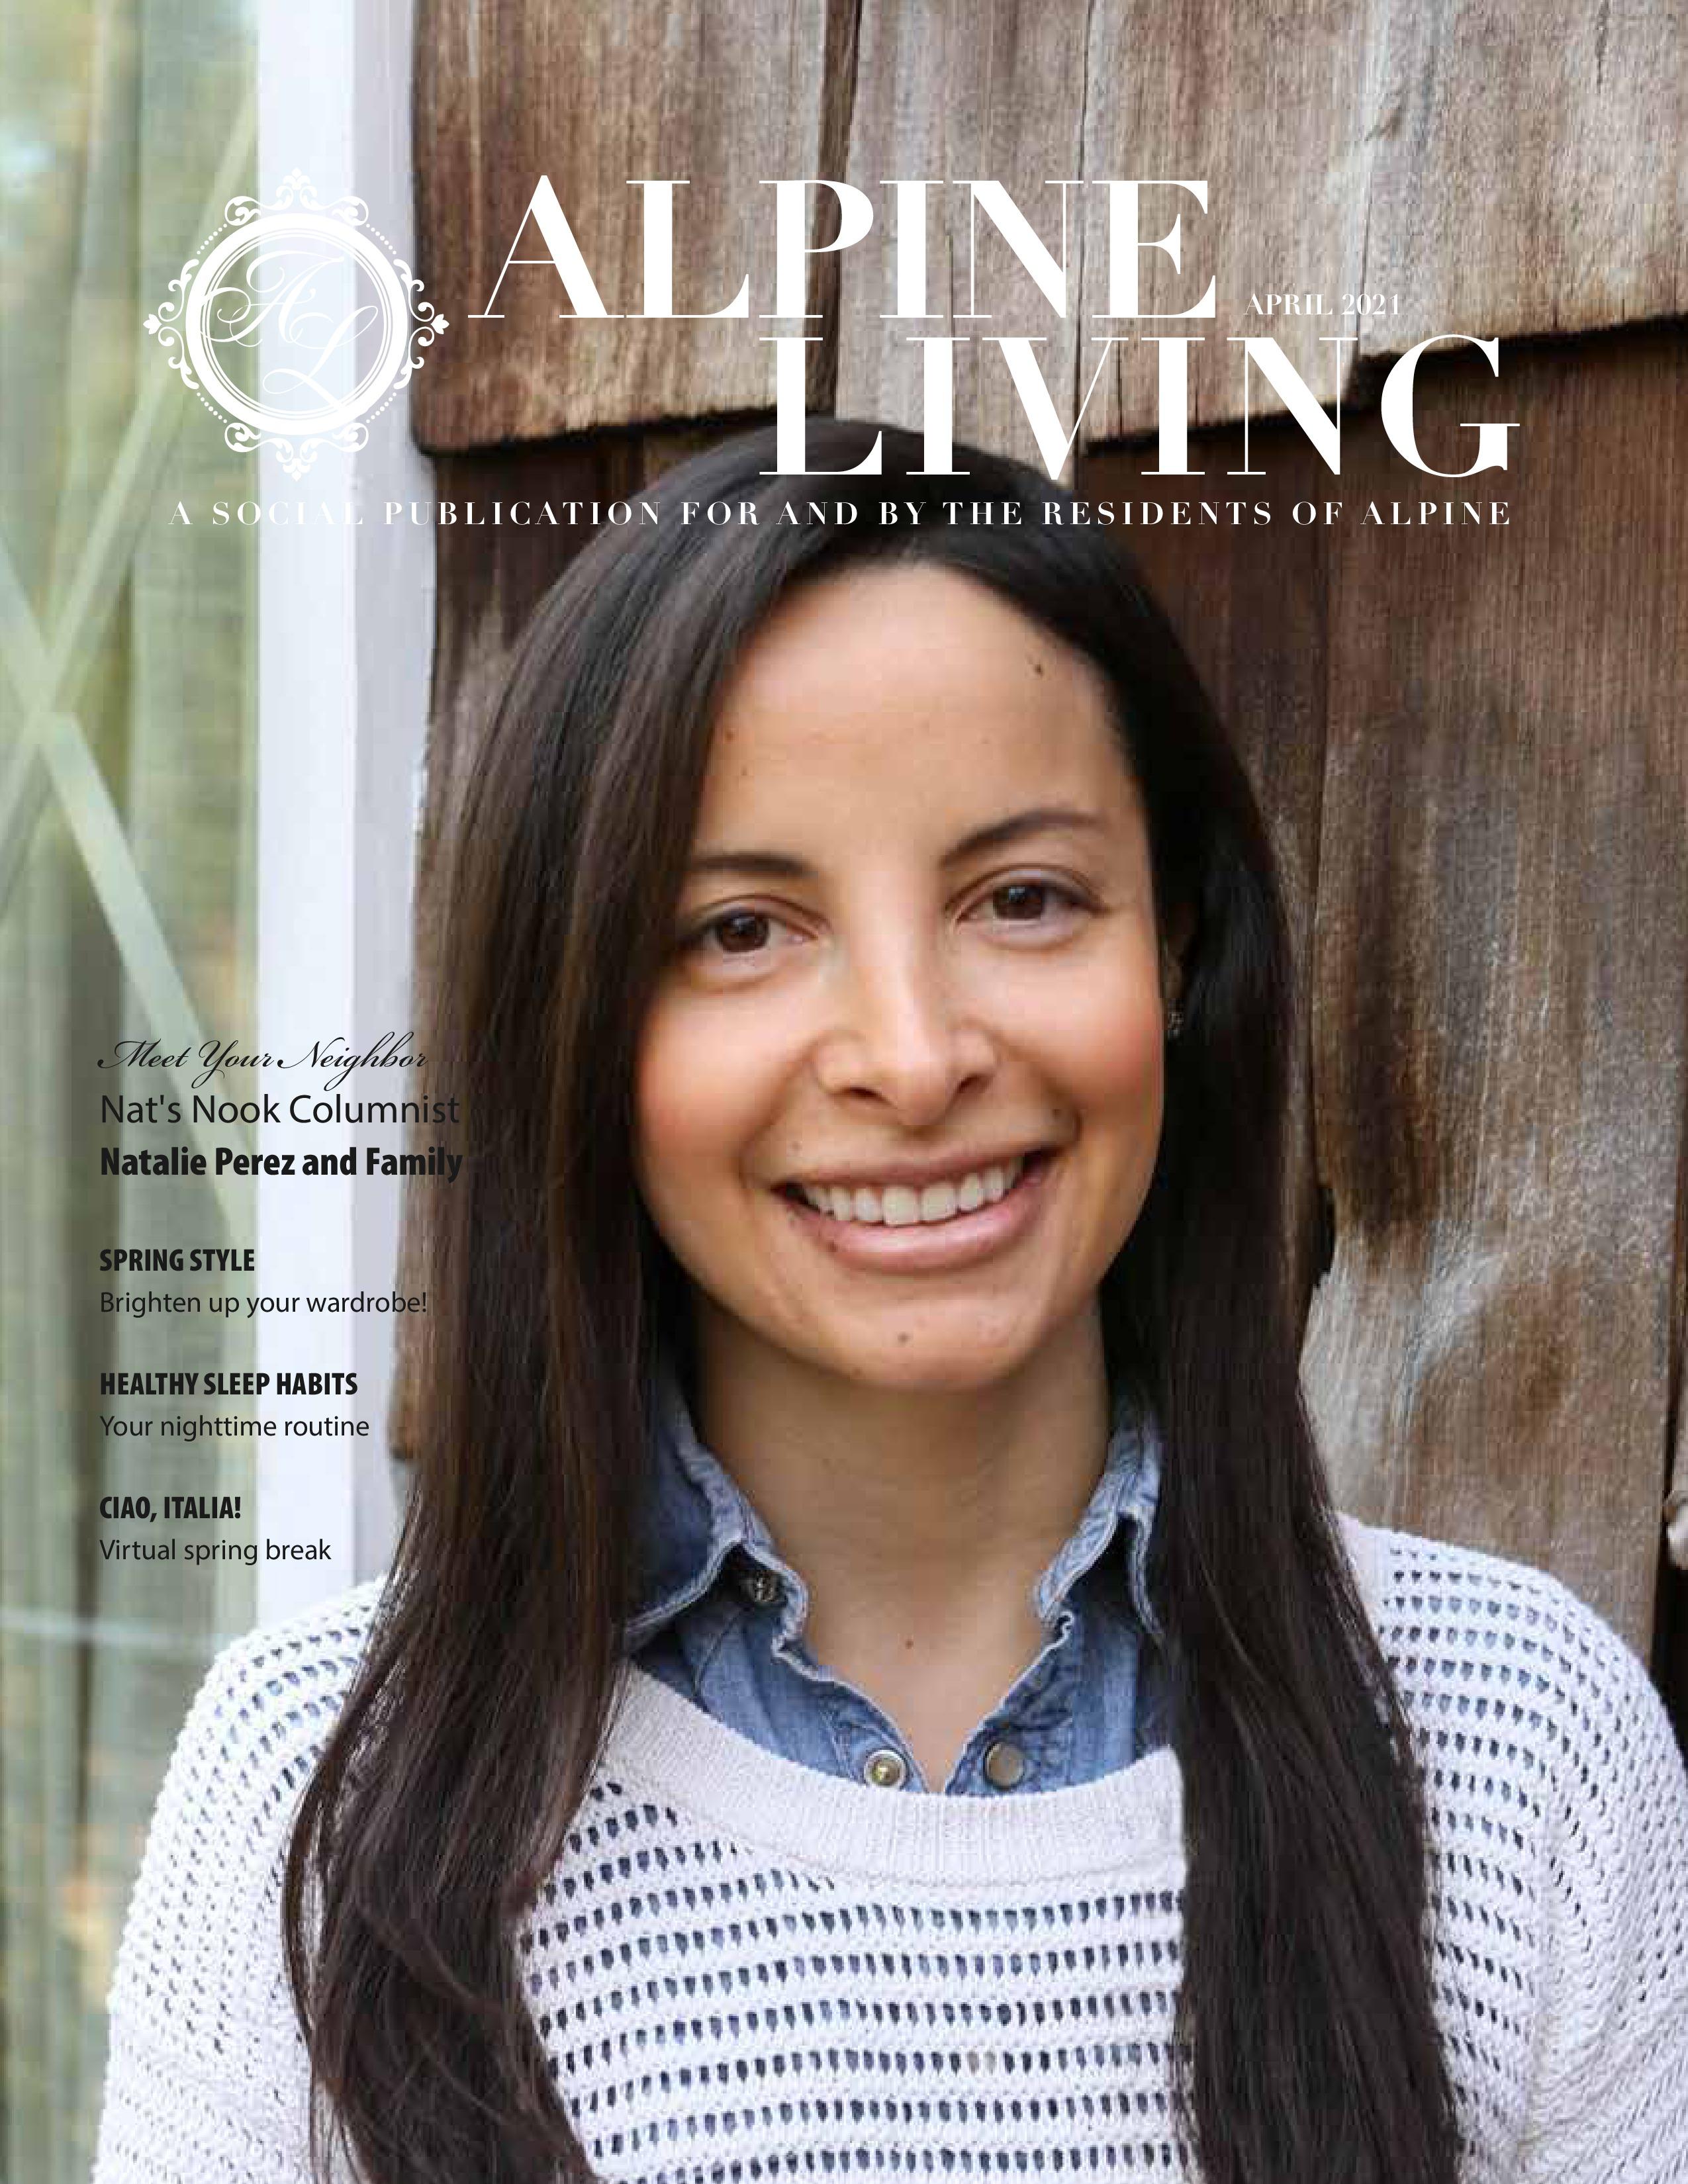 Alpine Living 2021-04-01